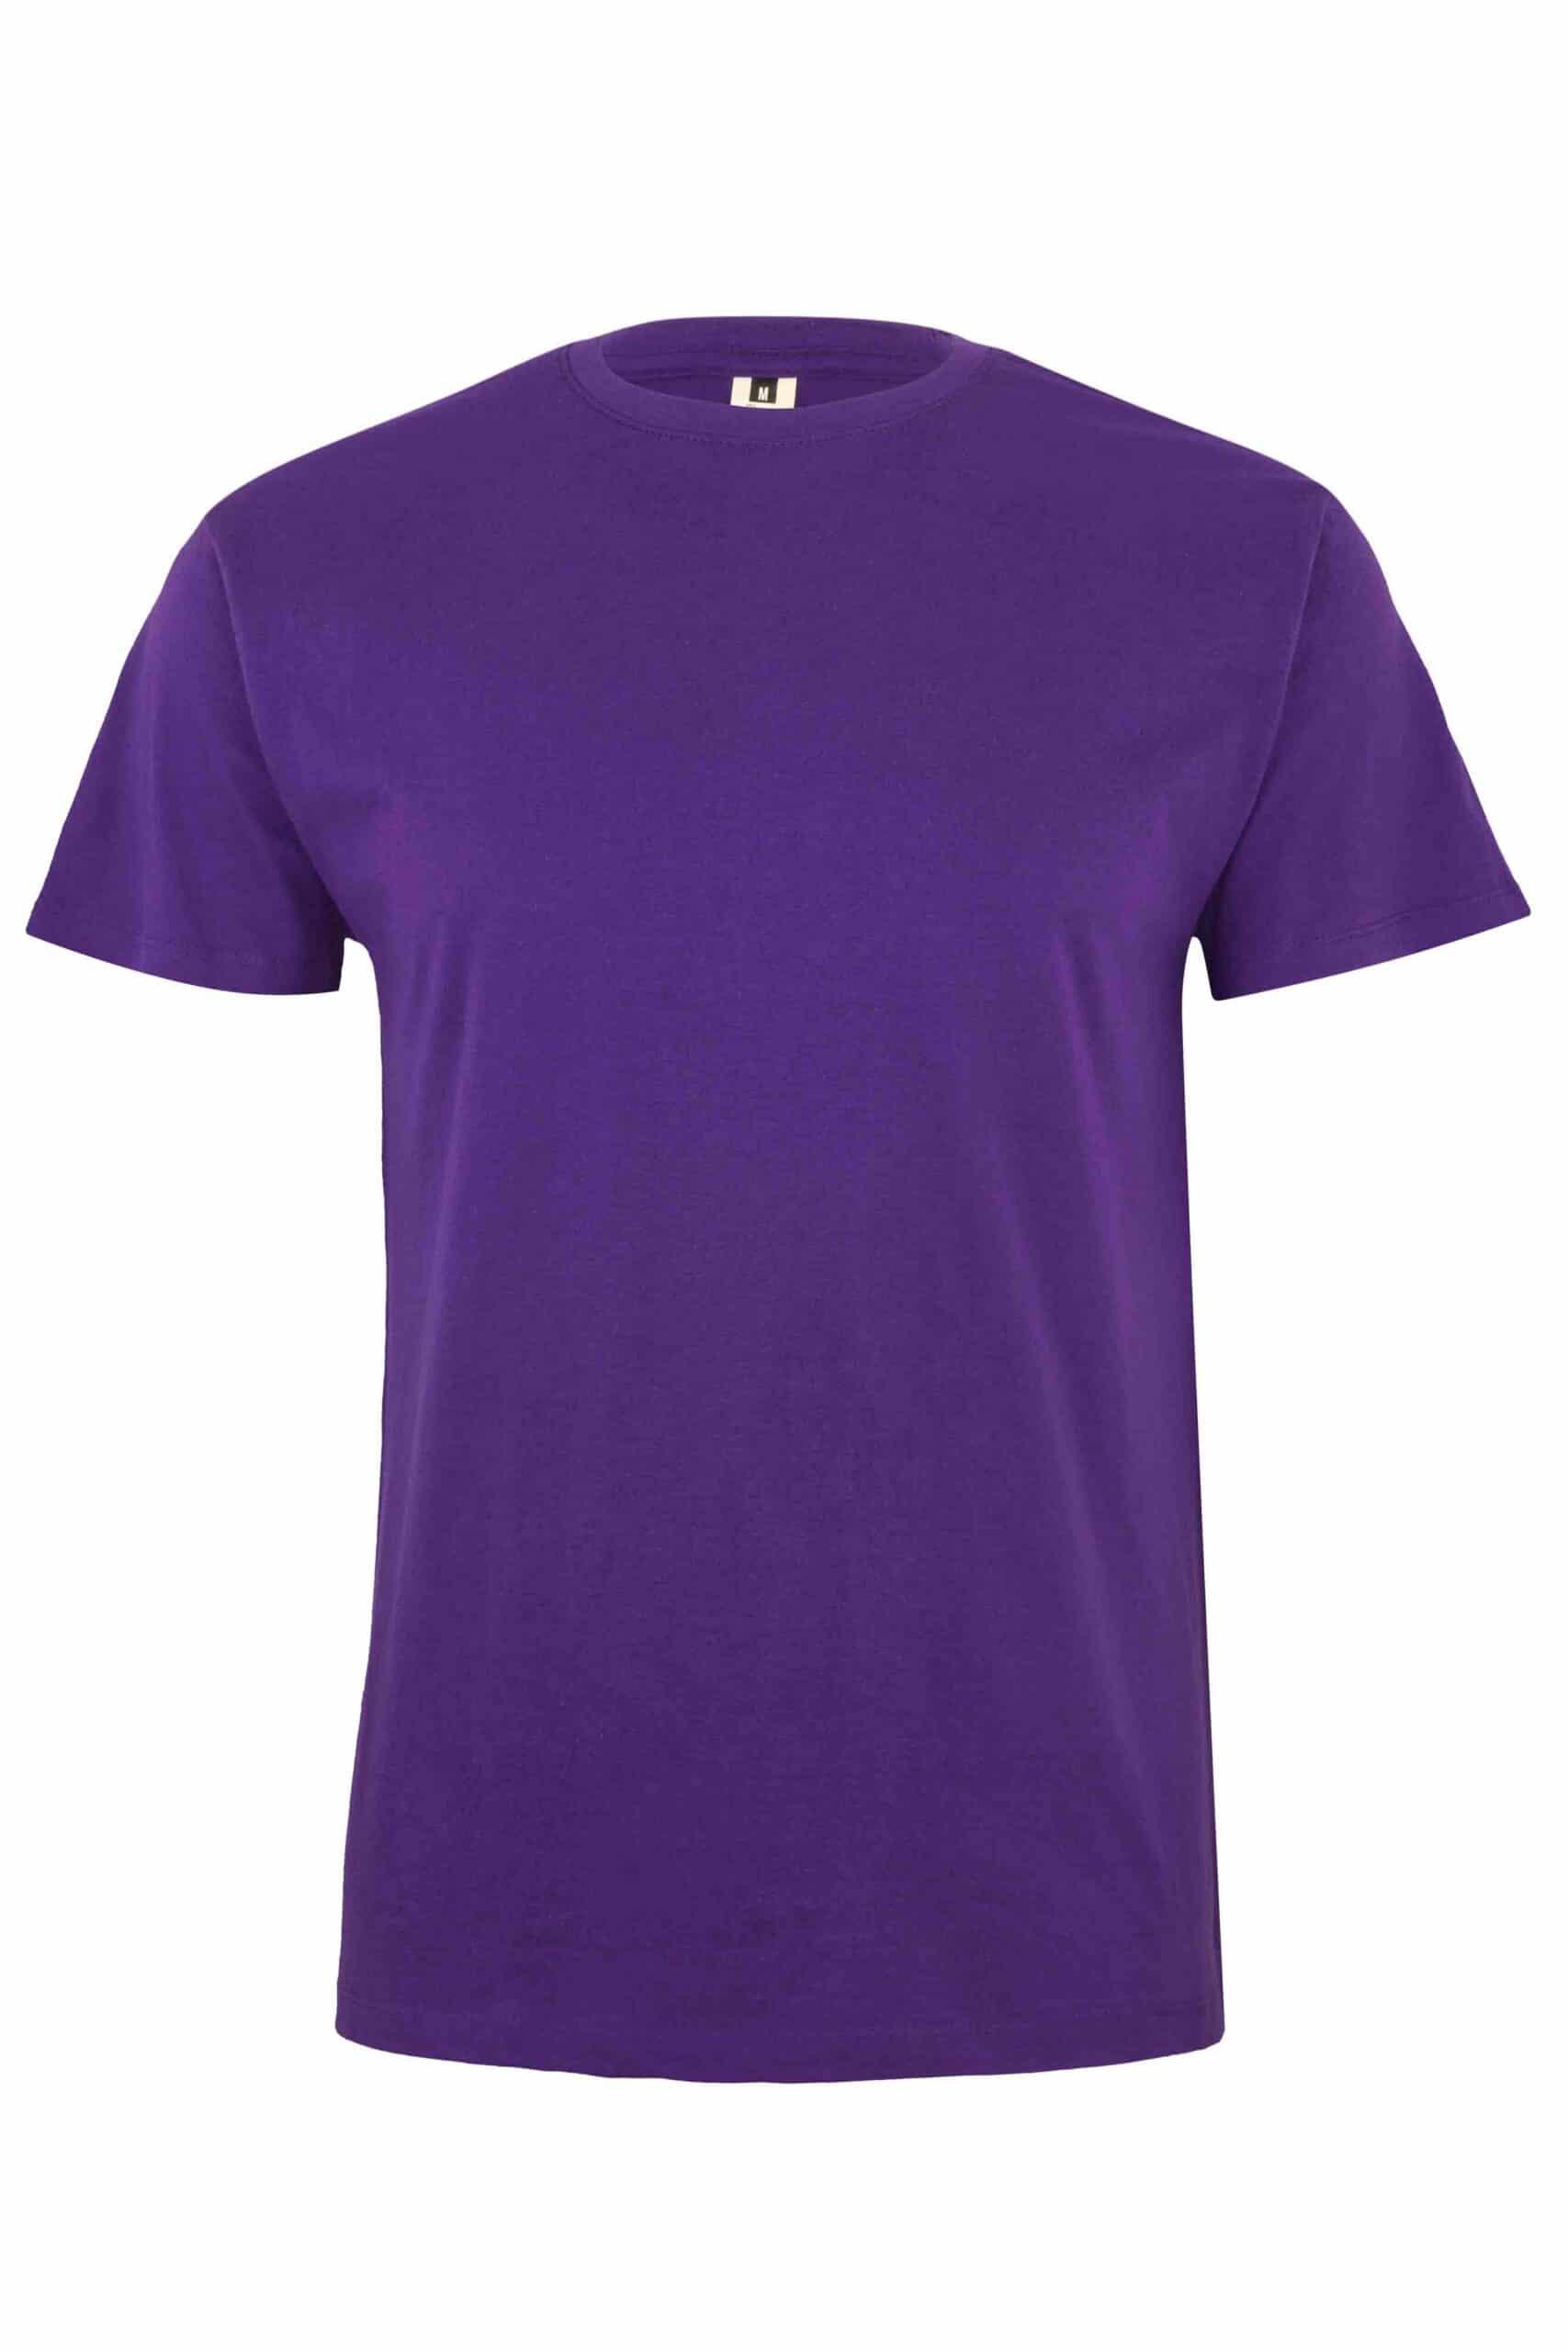 Mukua Mk022cv Camiseta Manga Corta 150gr Purple